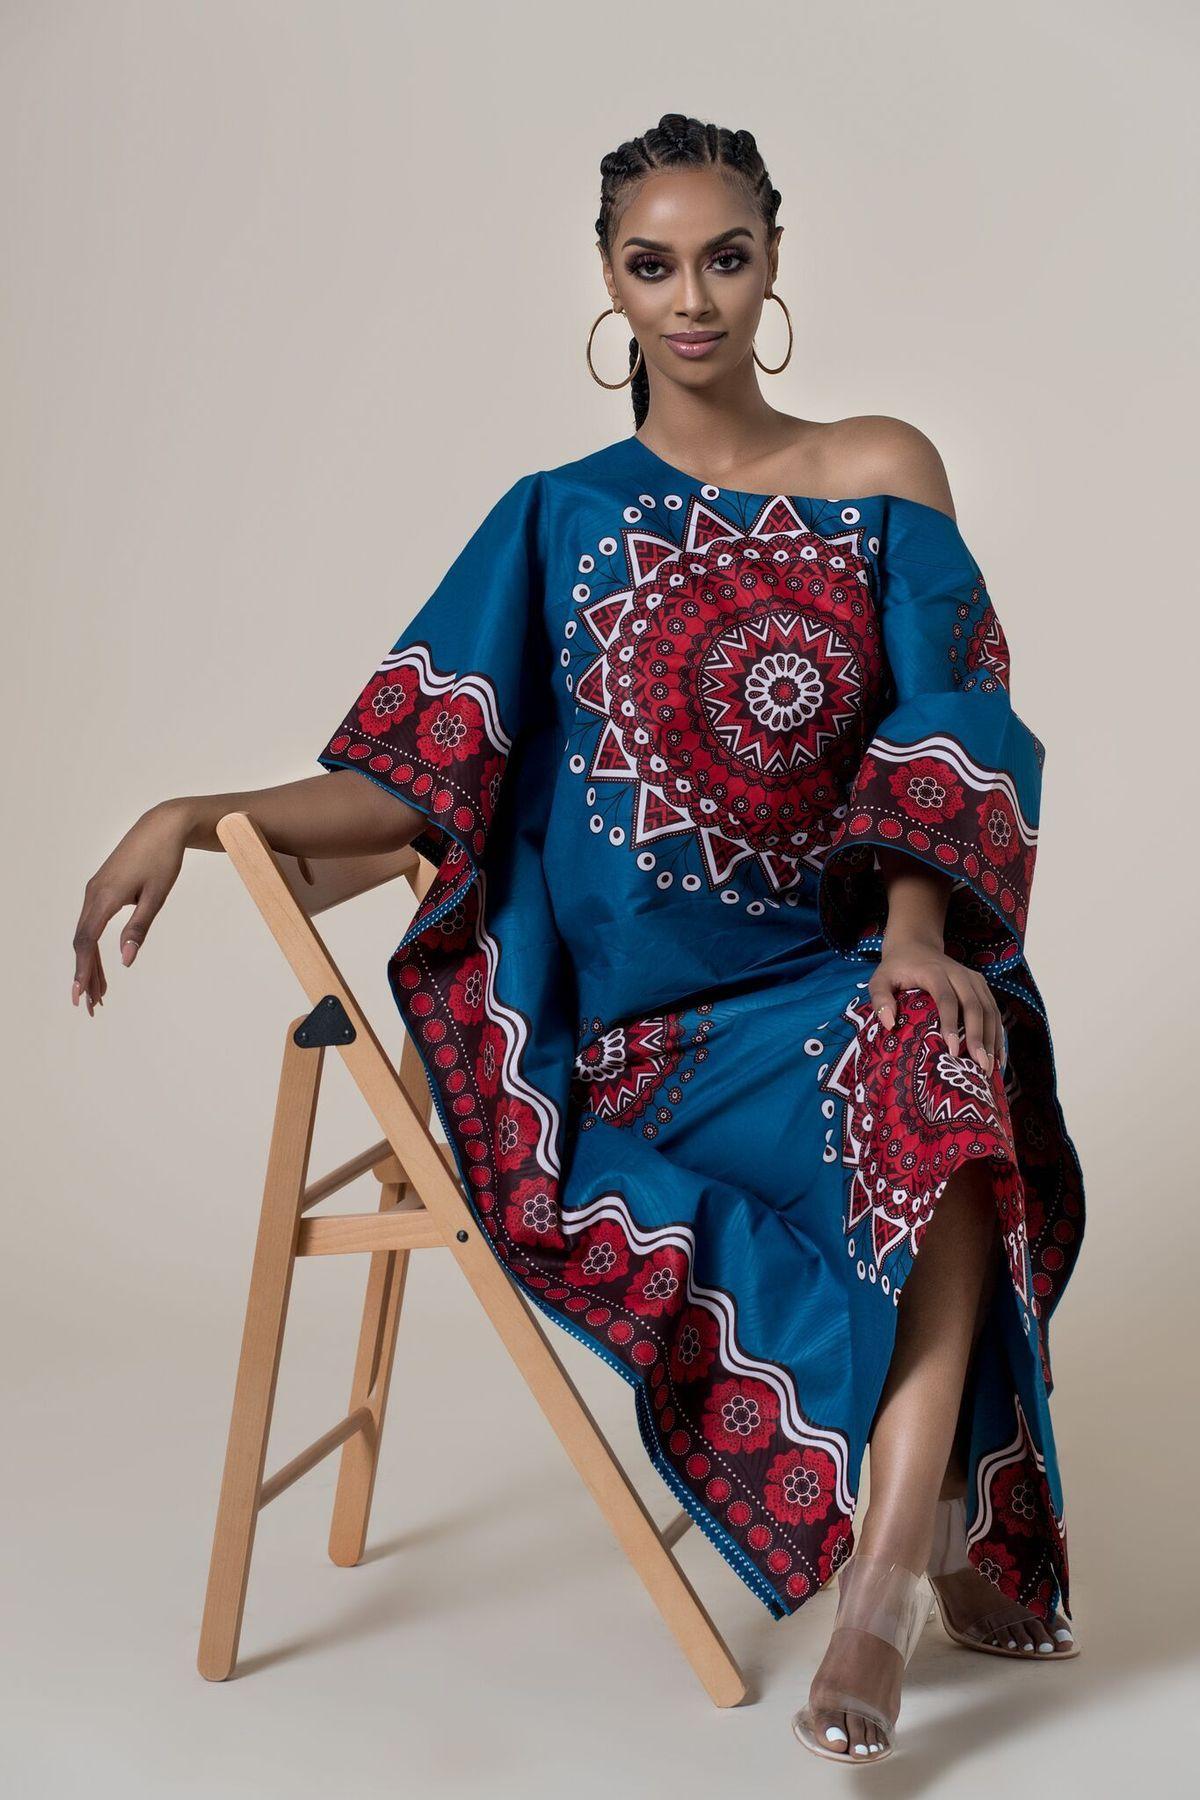 grass-fields-mid-lenght-dresses-us4-uk8-us8-uk12-african-print-helena-maxi-dress-7921654595642_1200x.jpg